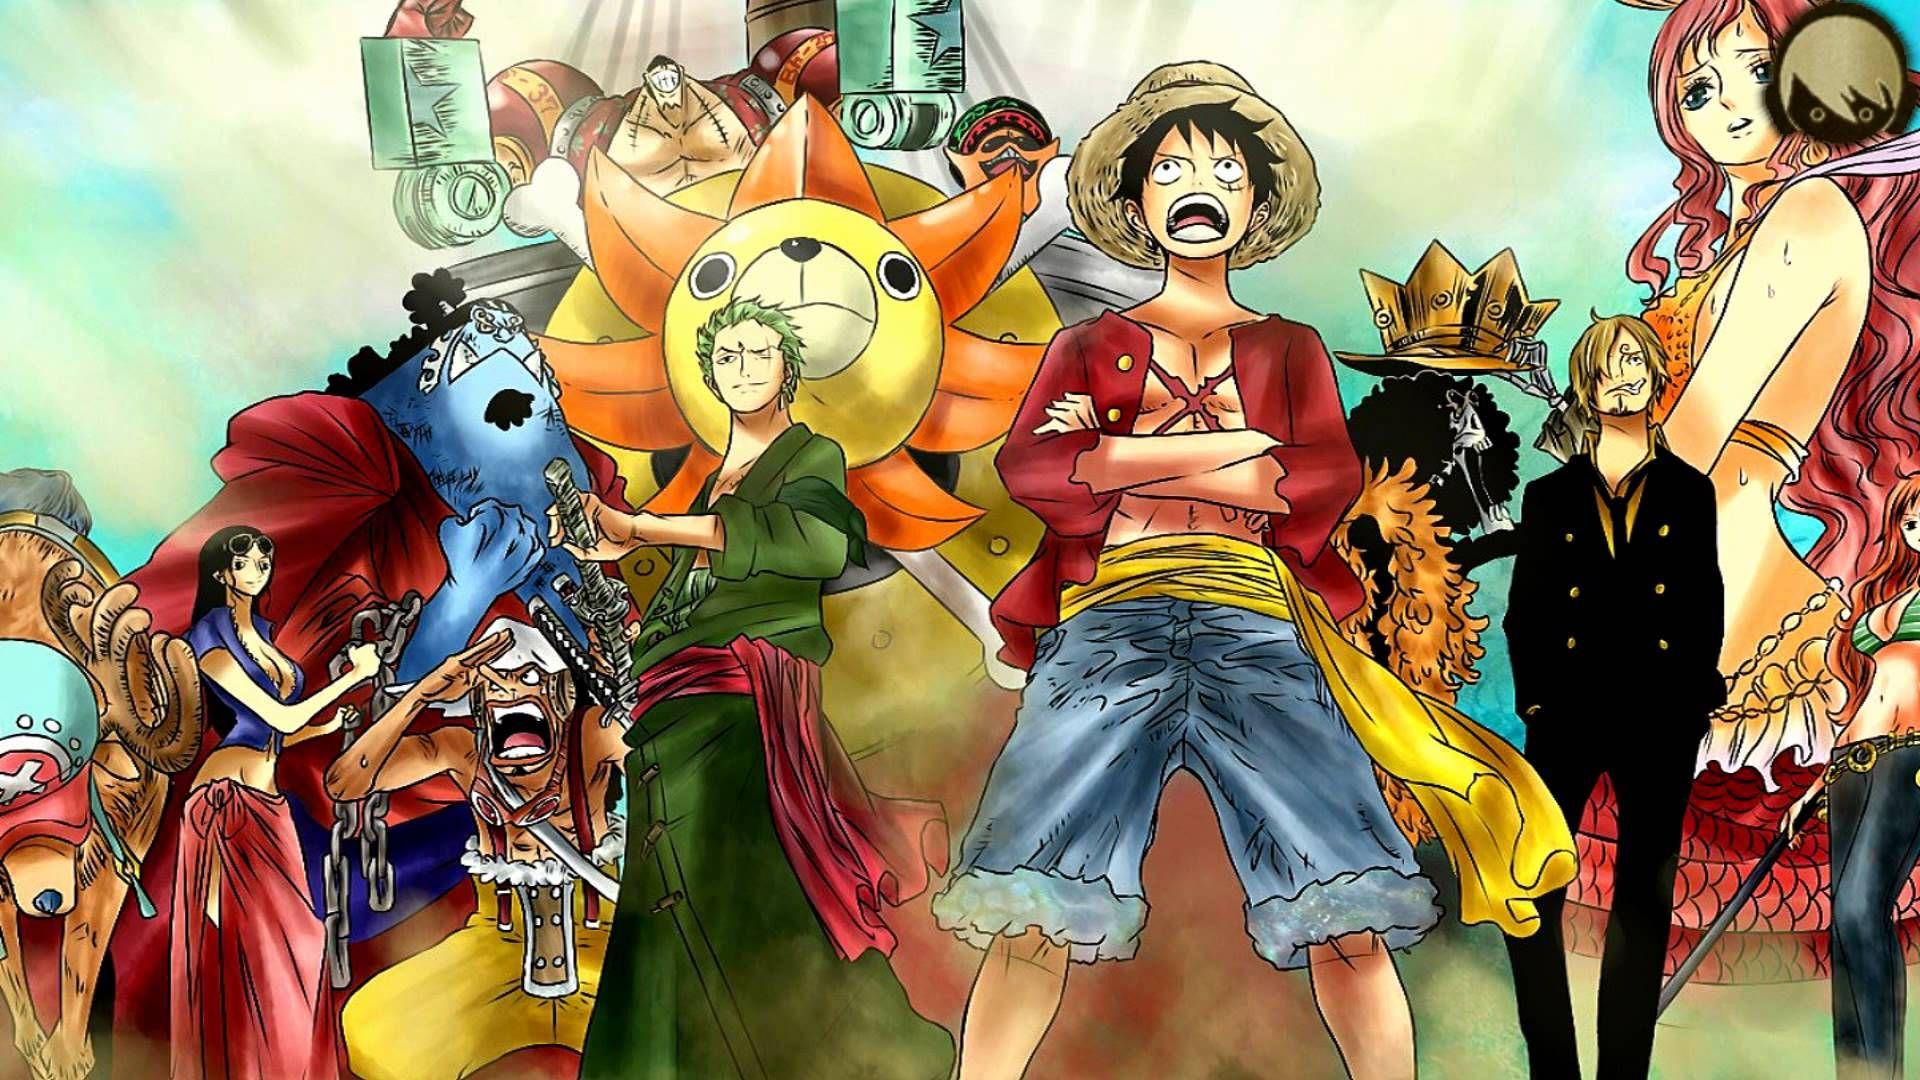 Wallpaper One Piece Vs Naruto En 2020 Avec Images